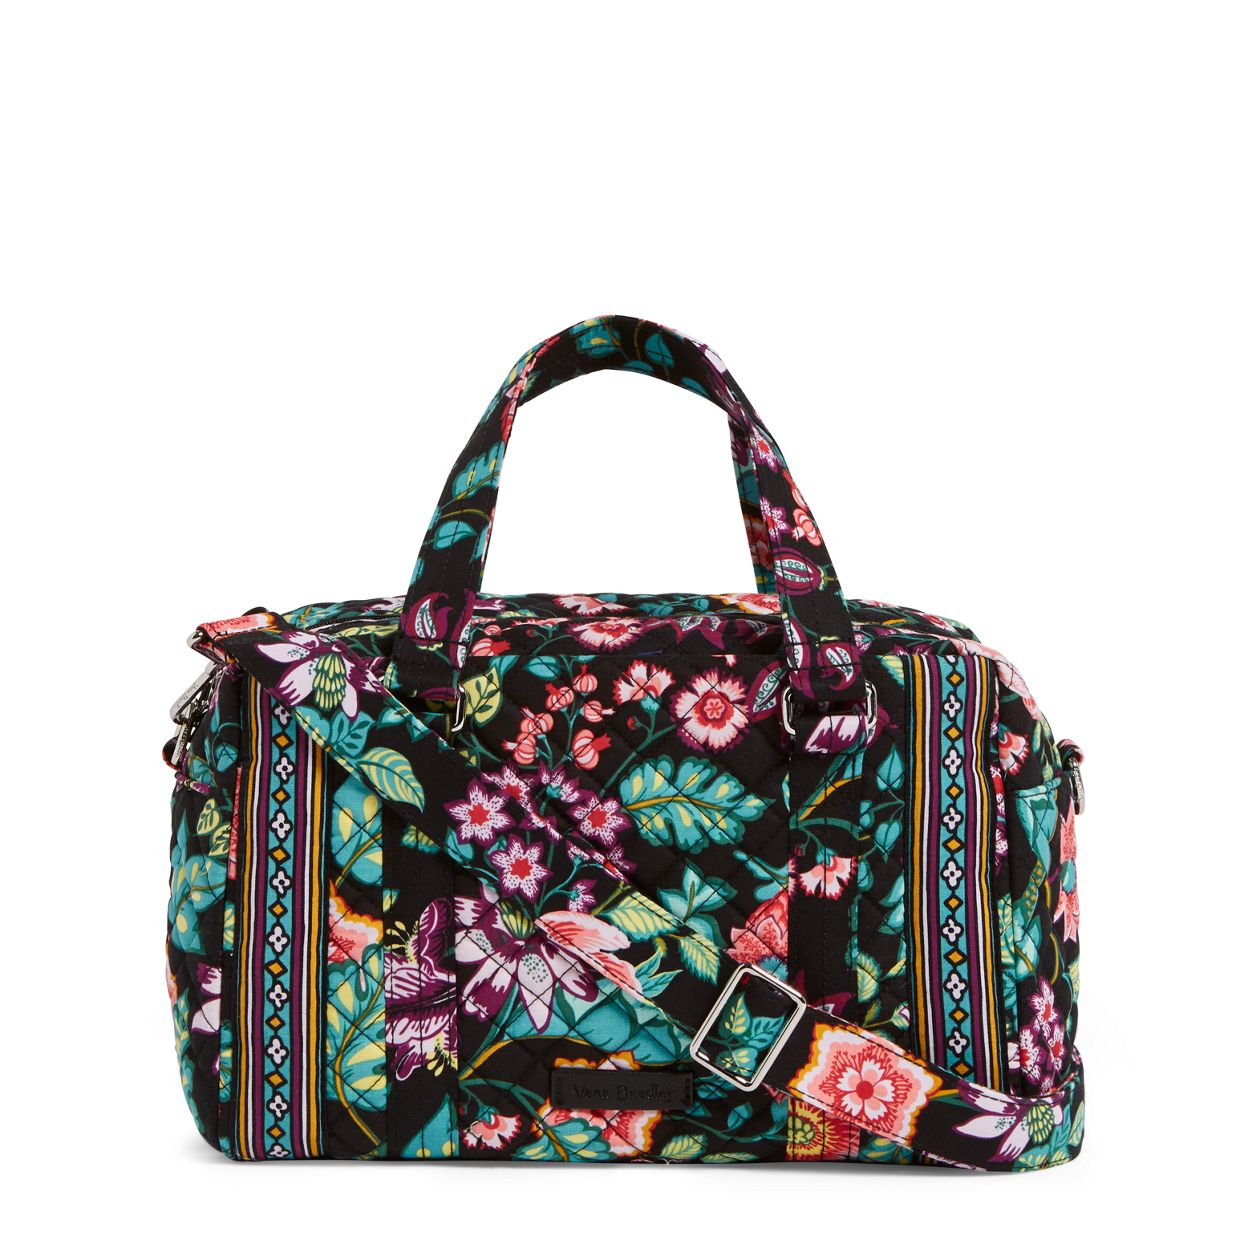 Image of Iconic 100 Handbag in Vines Floral 44ec20a4c7ce5